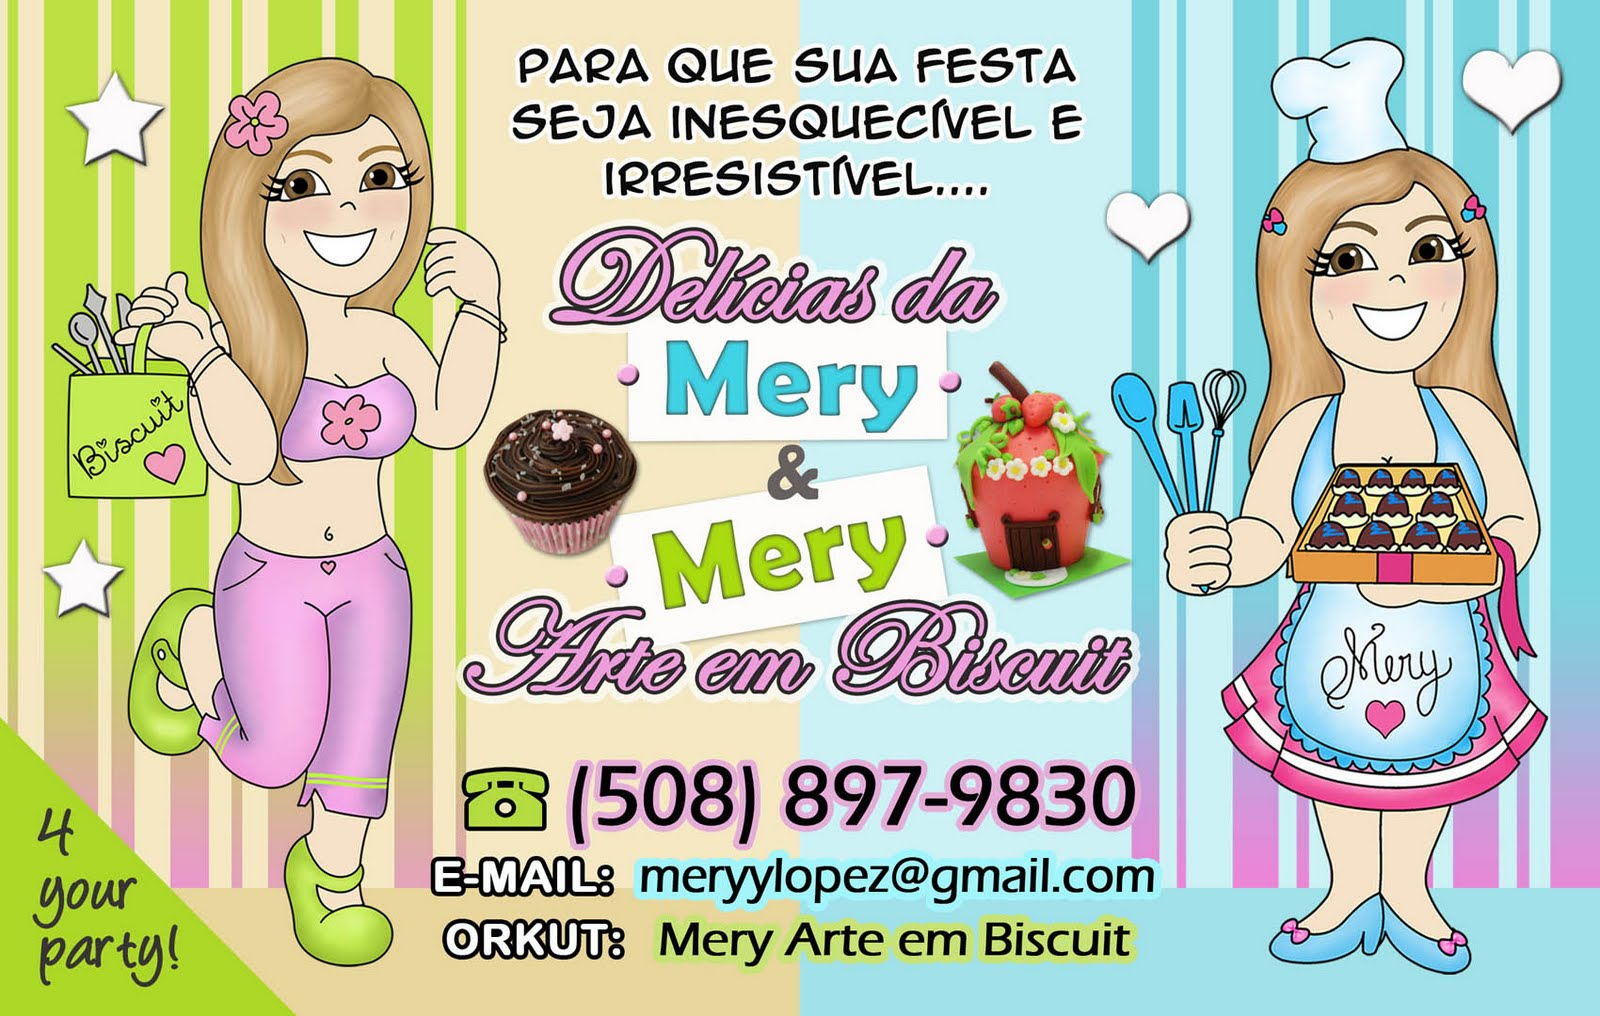 Delícias da Mery & Mery Arte em Biscuit